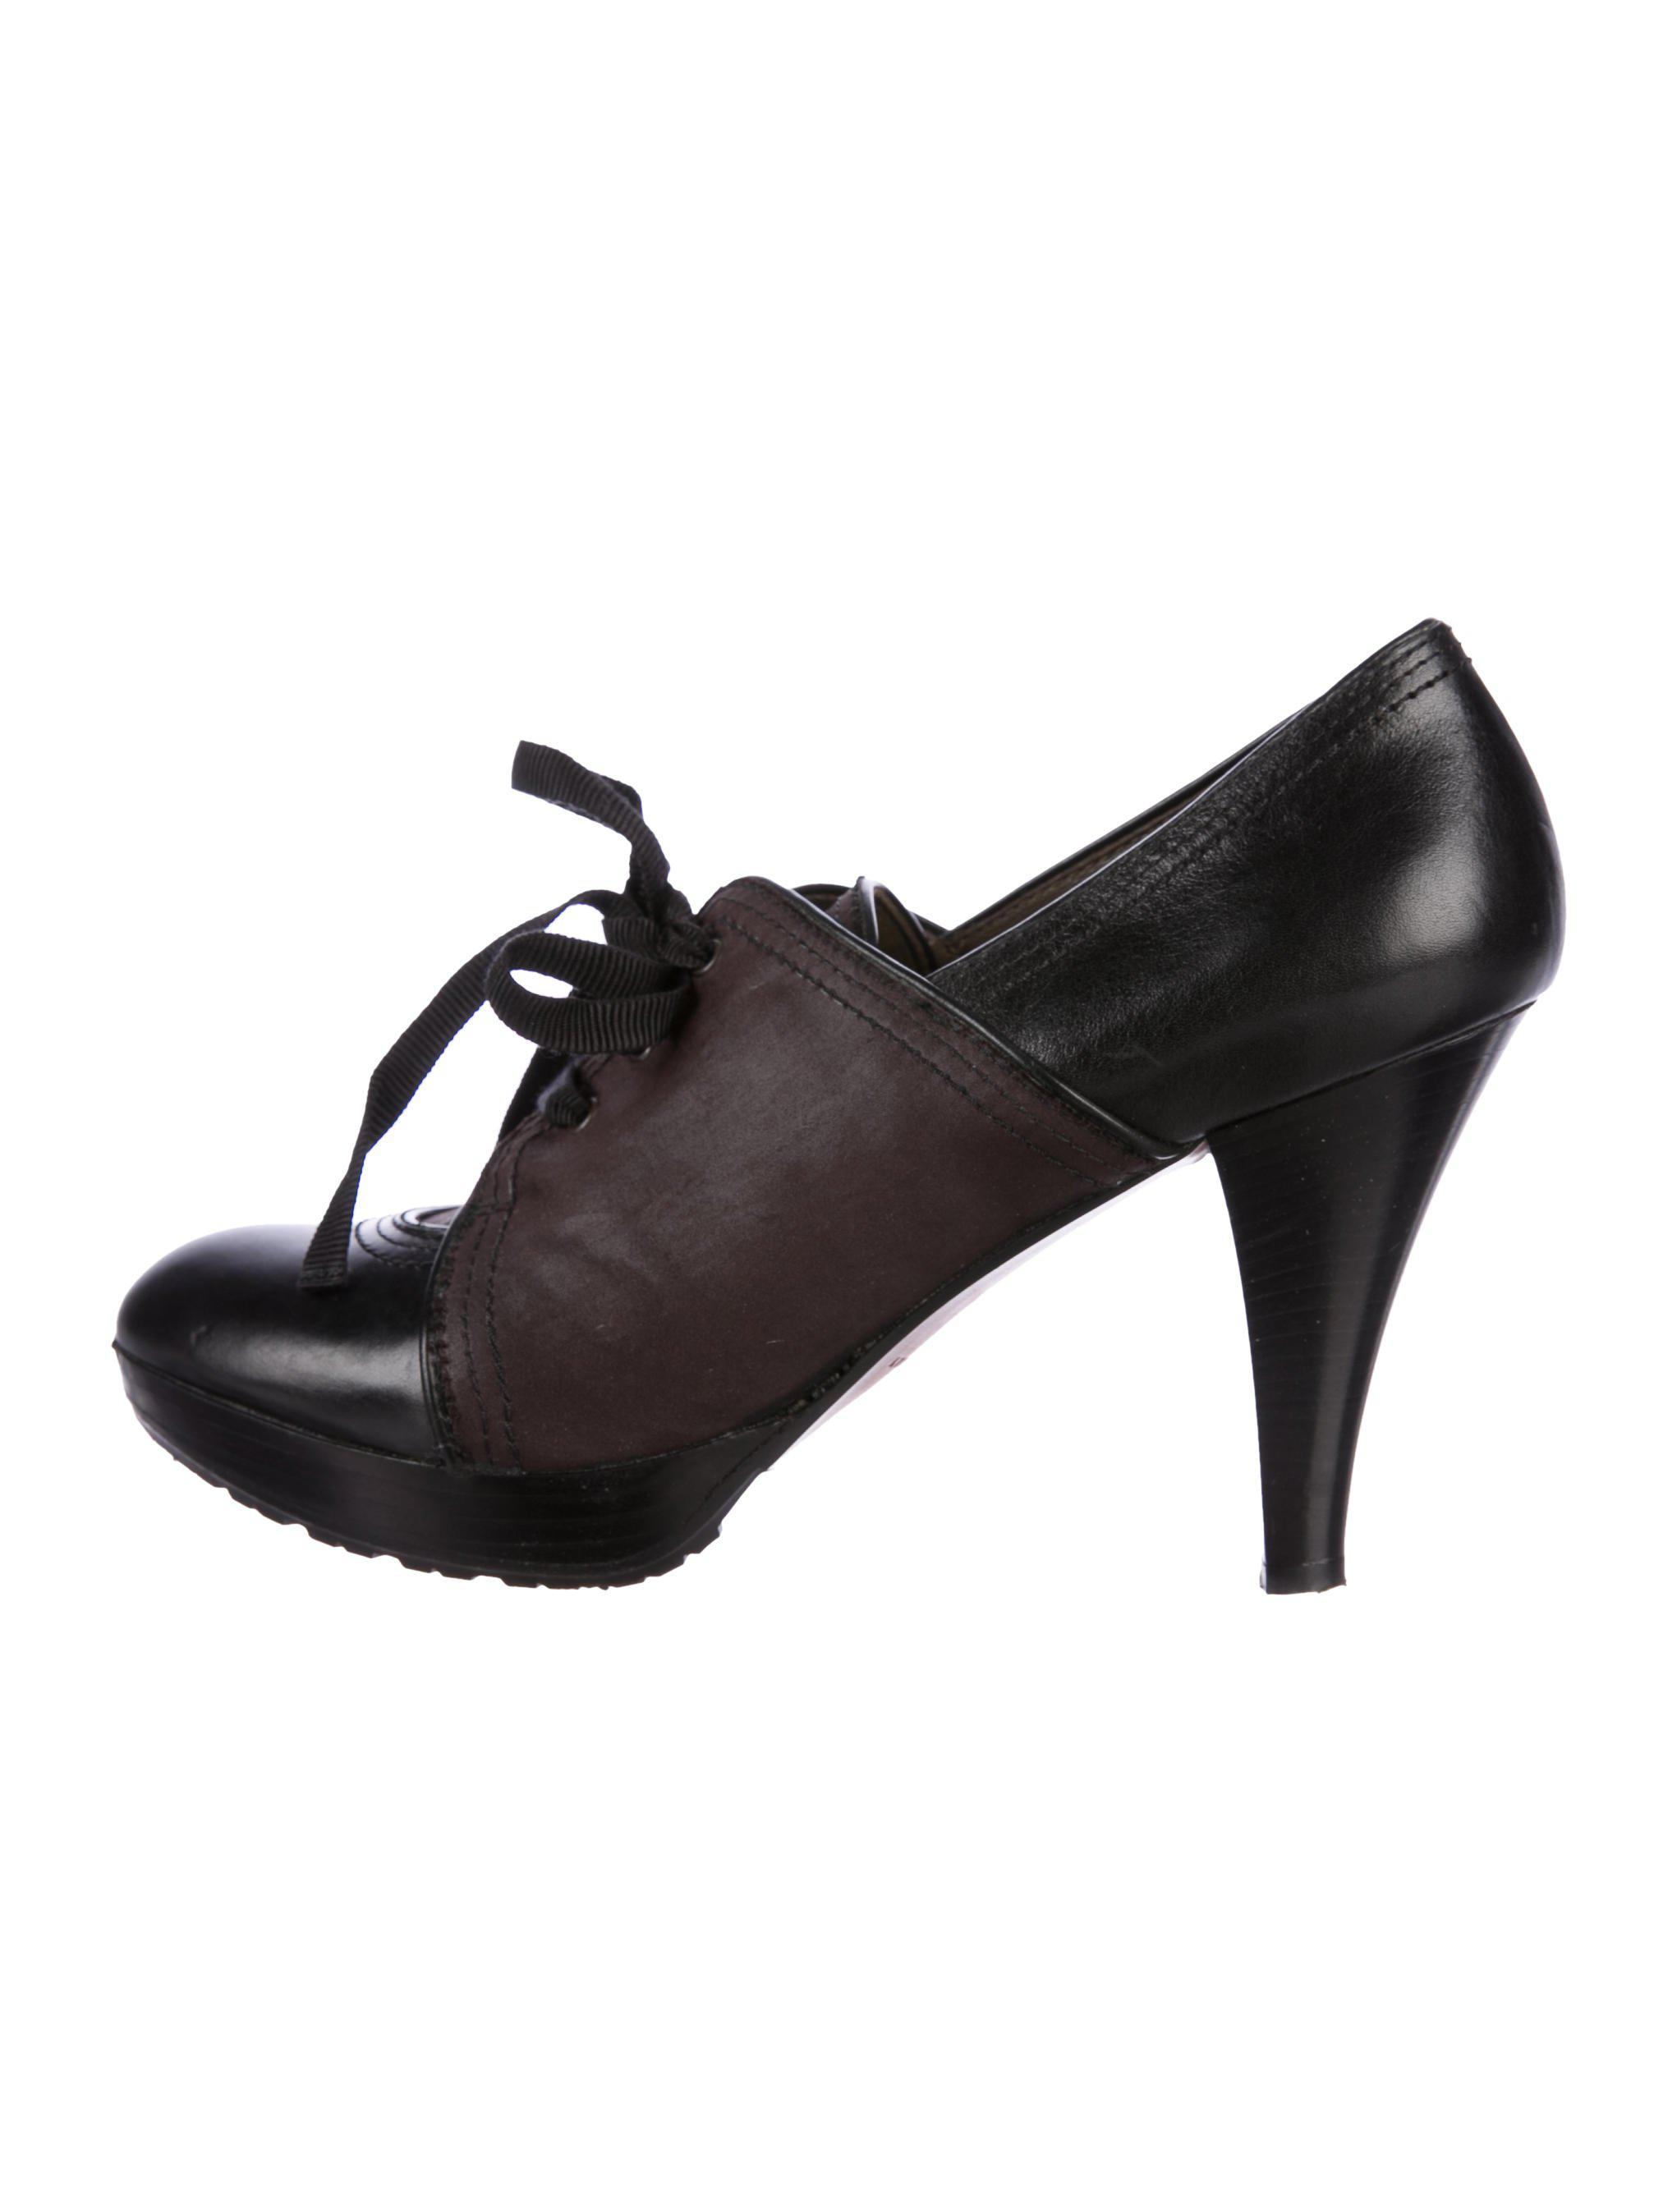 Pedro Garcia Patent Leather Round-Toe Booties buy cheap websites k0jU63B